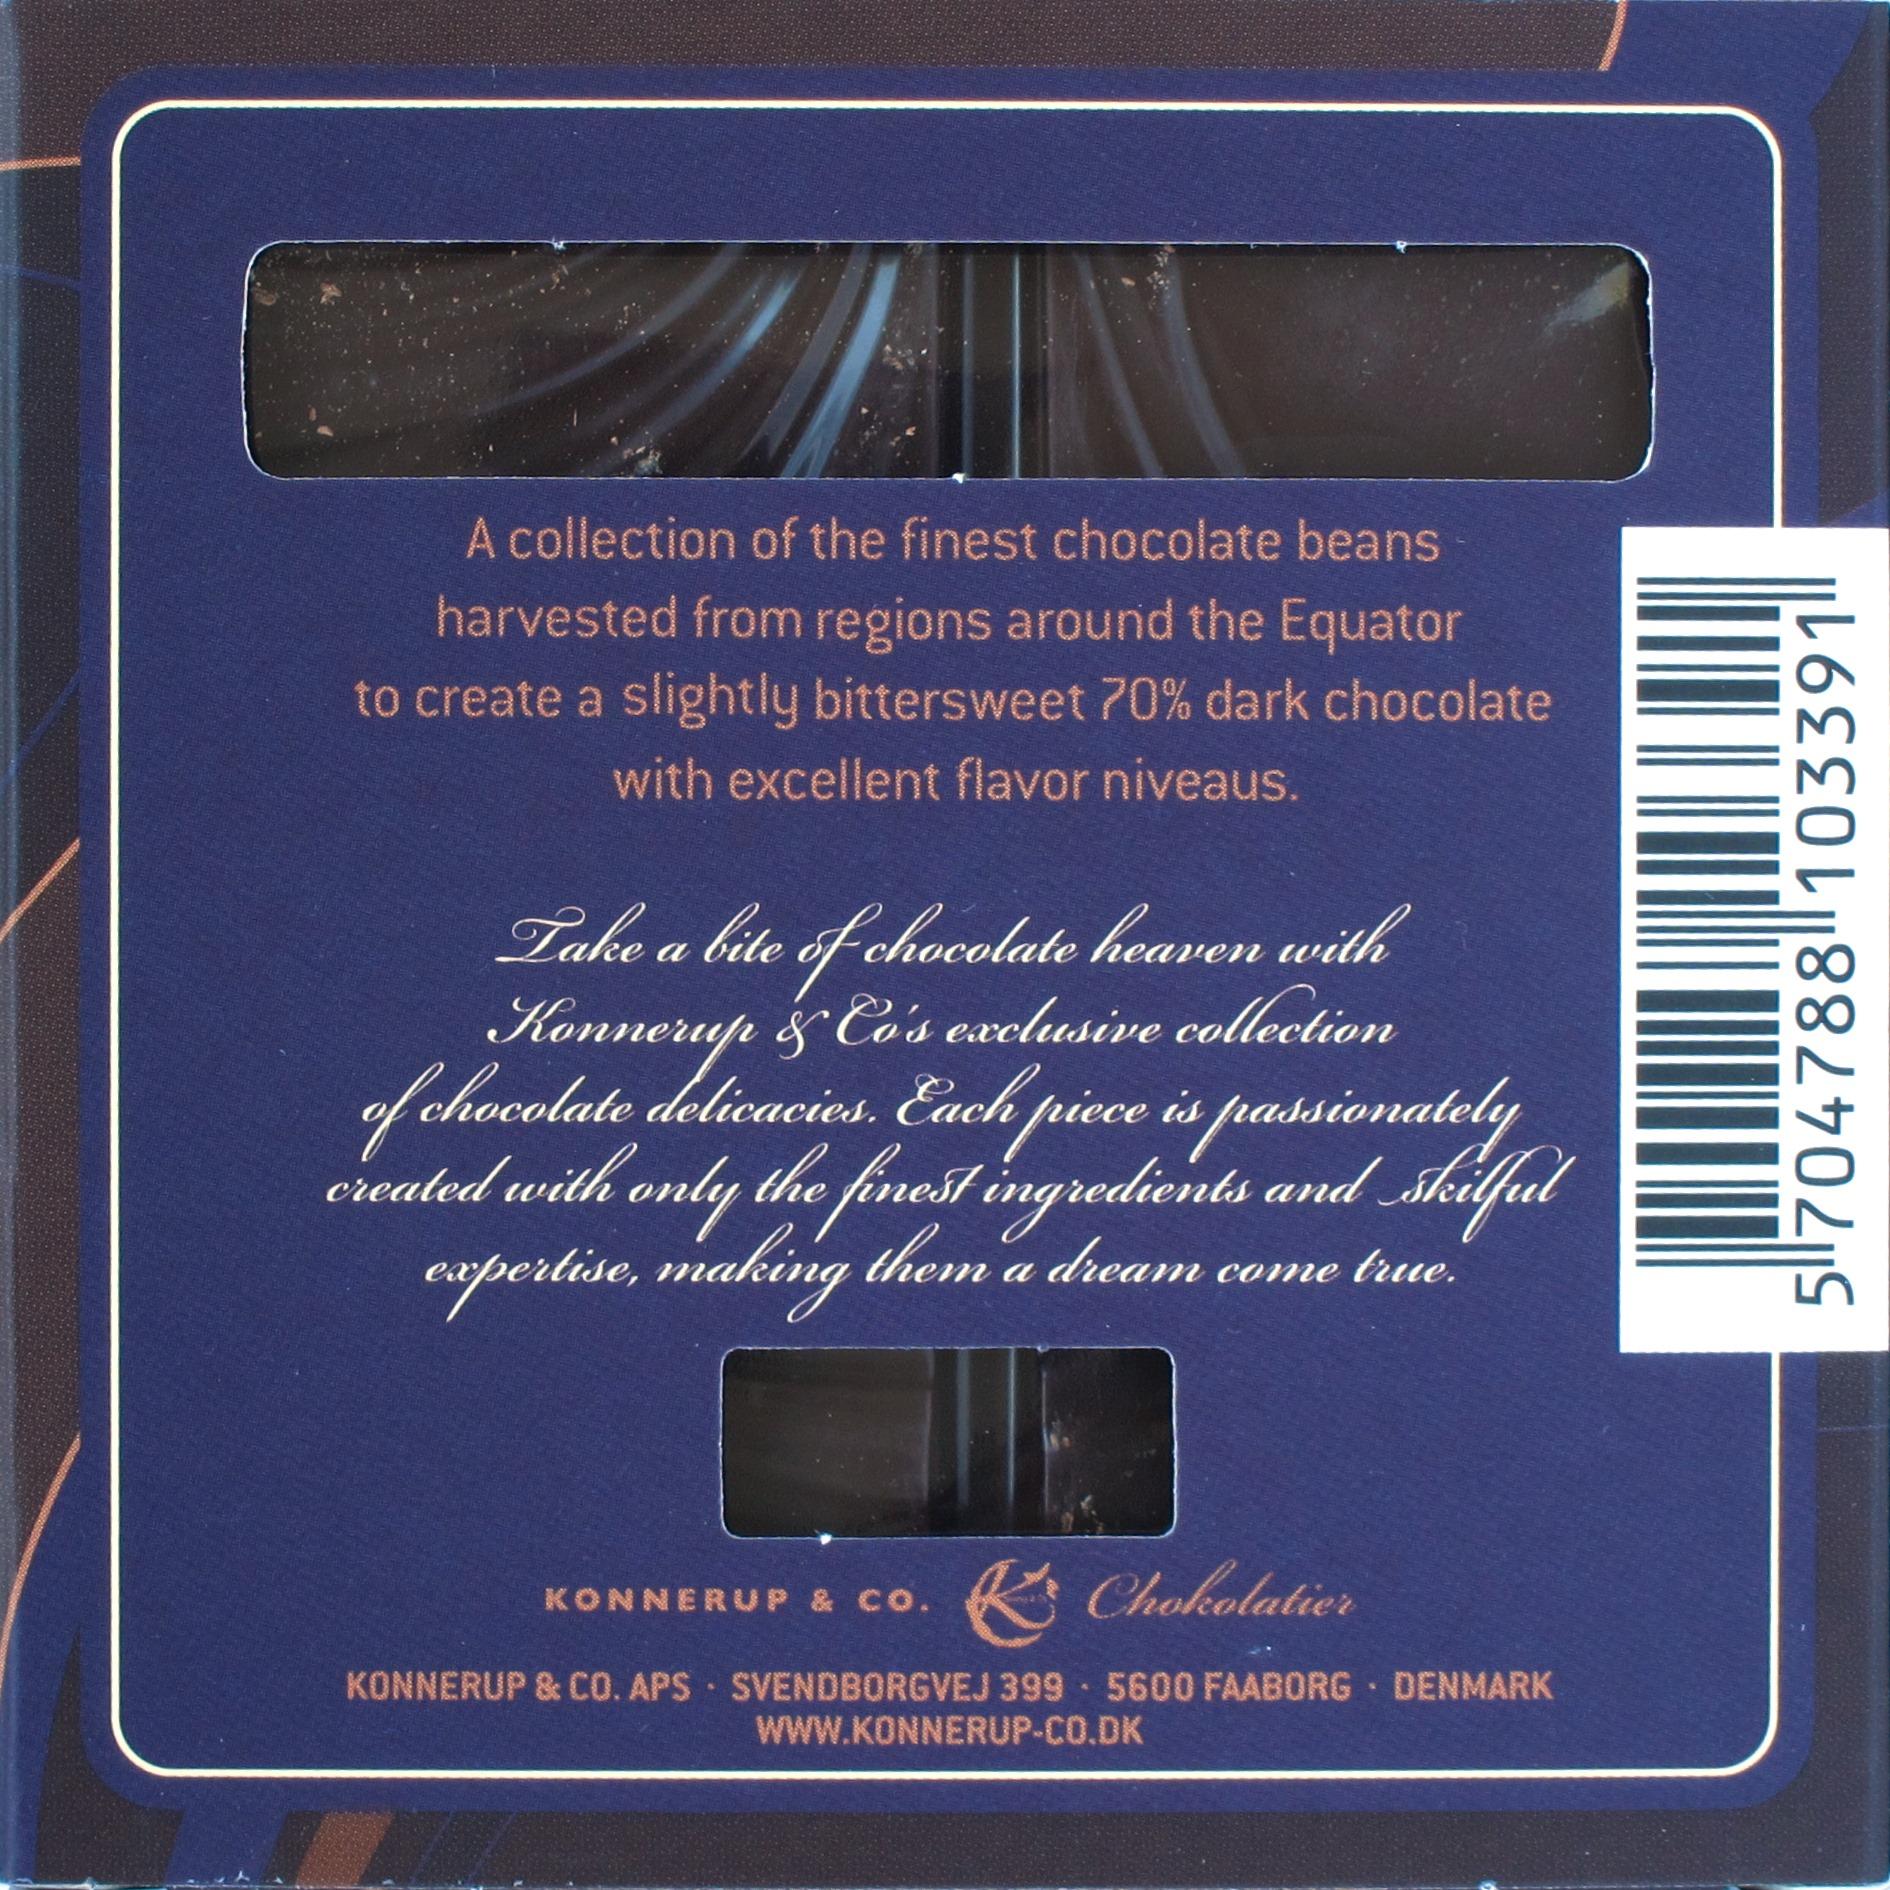 Konnerup & Co 70%-Schokolade, Packungsrückseite